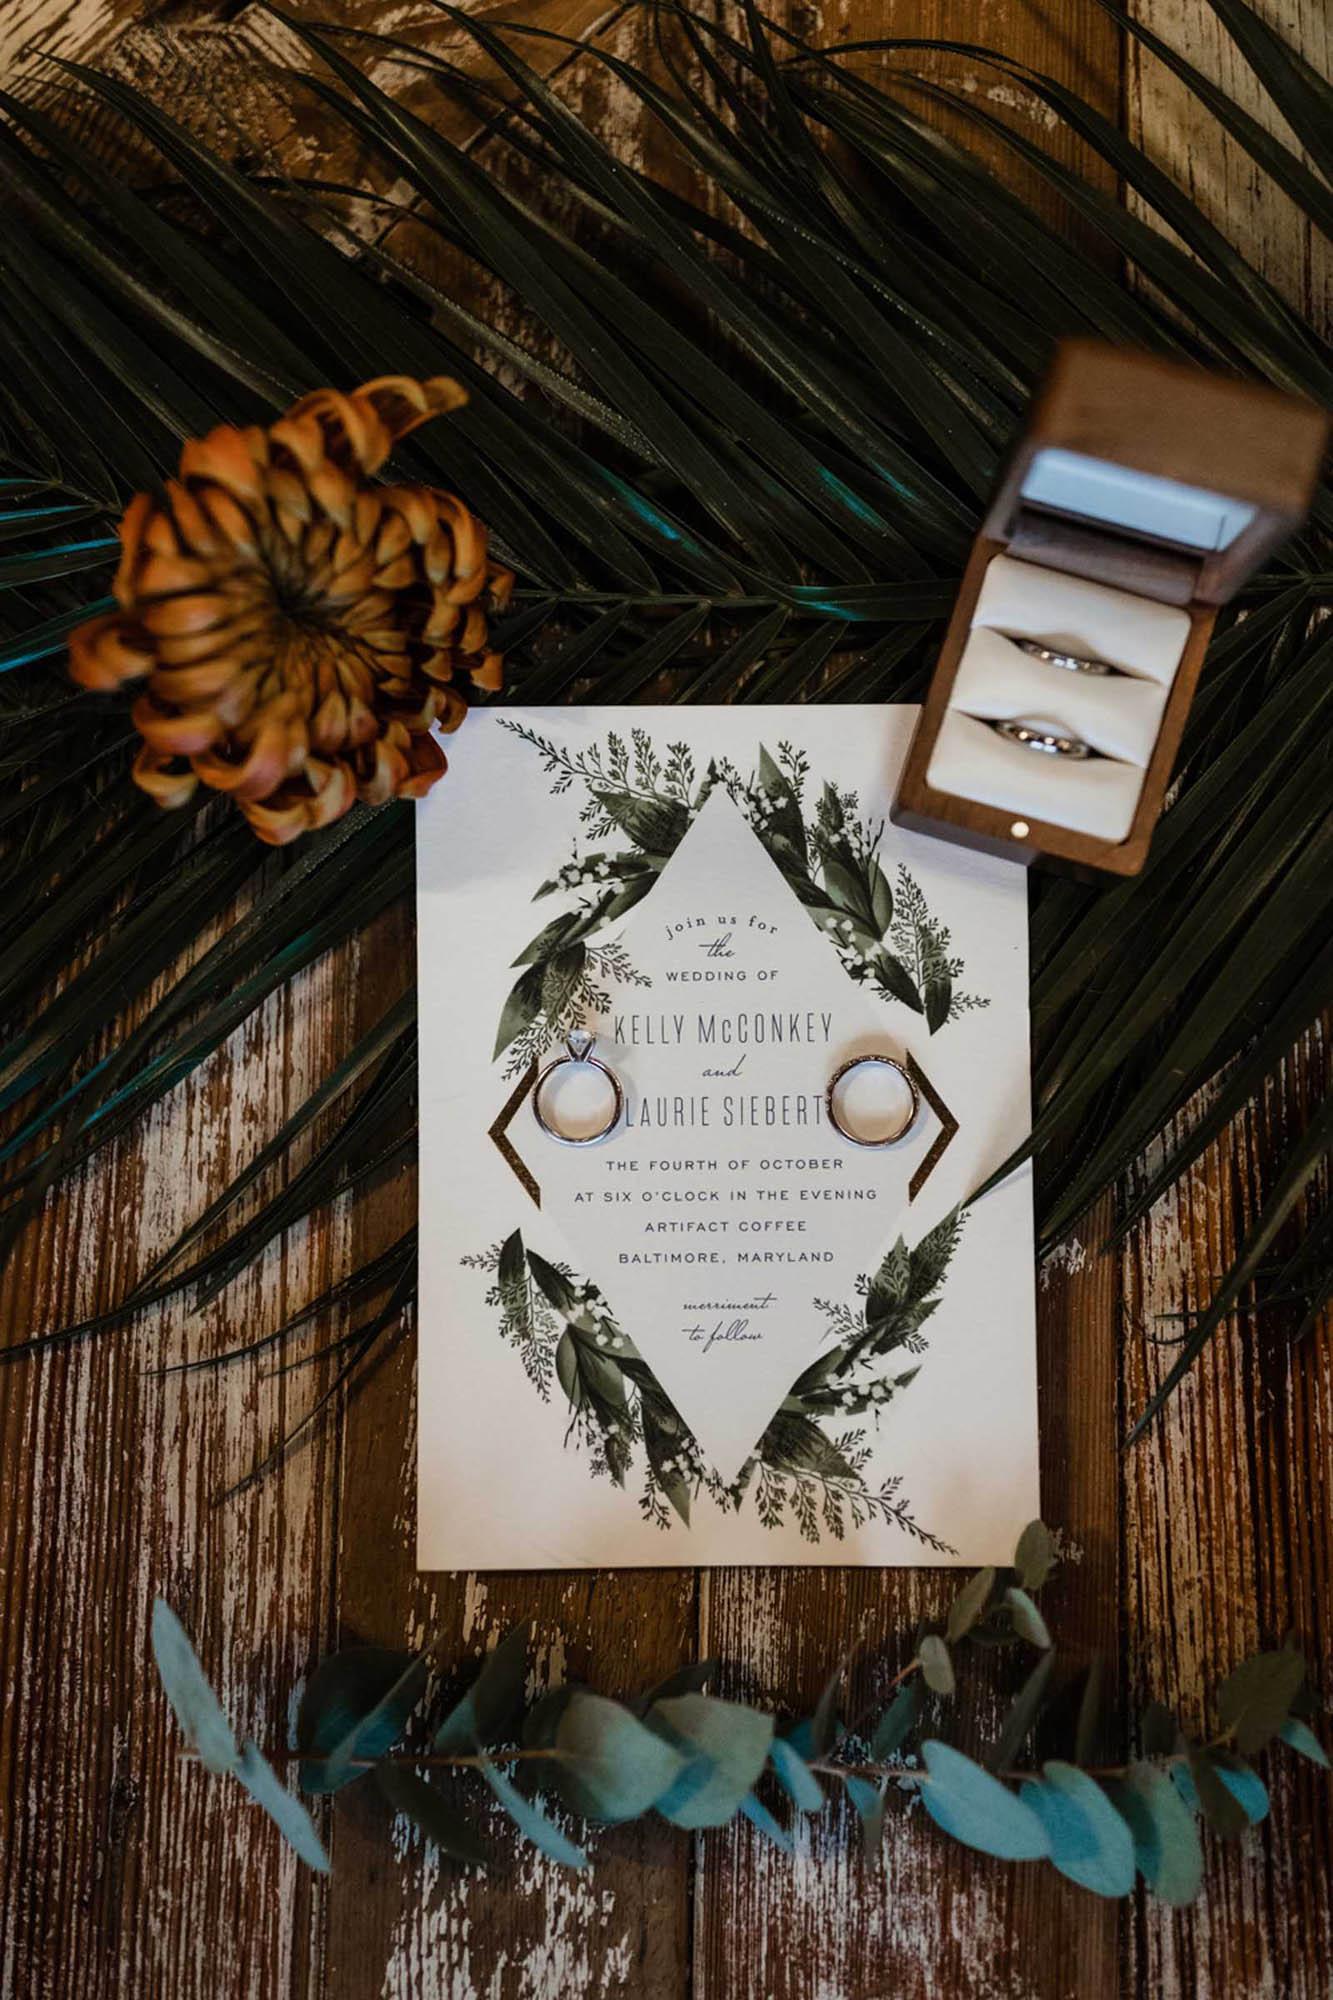 Queer Intimate Wedding in Baltimore - DIY Wedding